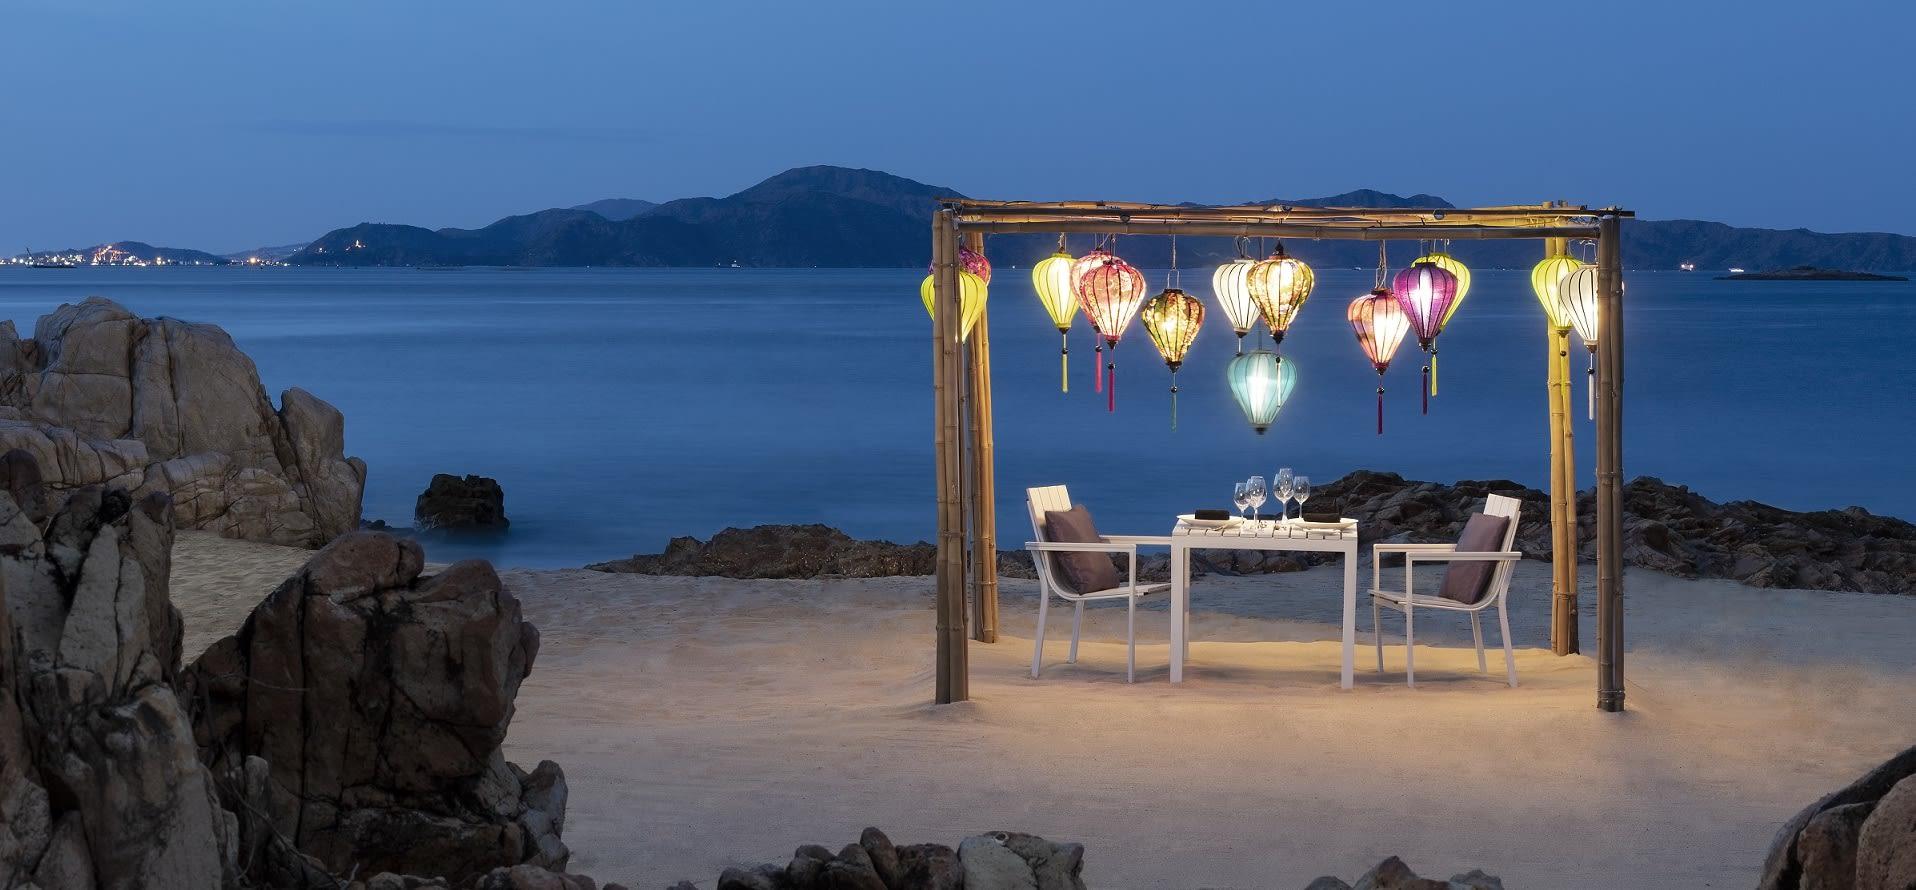 Avani Quy Nhon romantic private dining setting on the beach